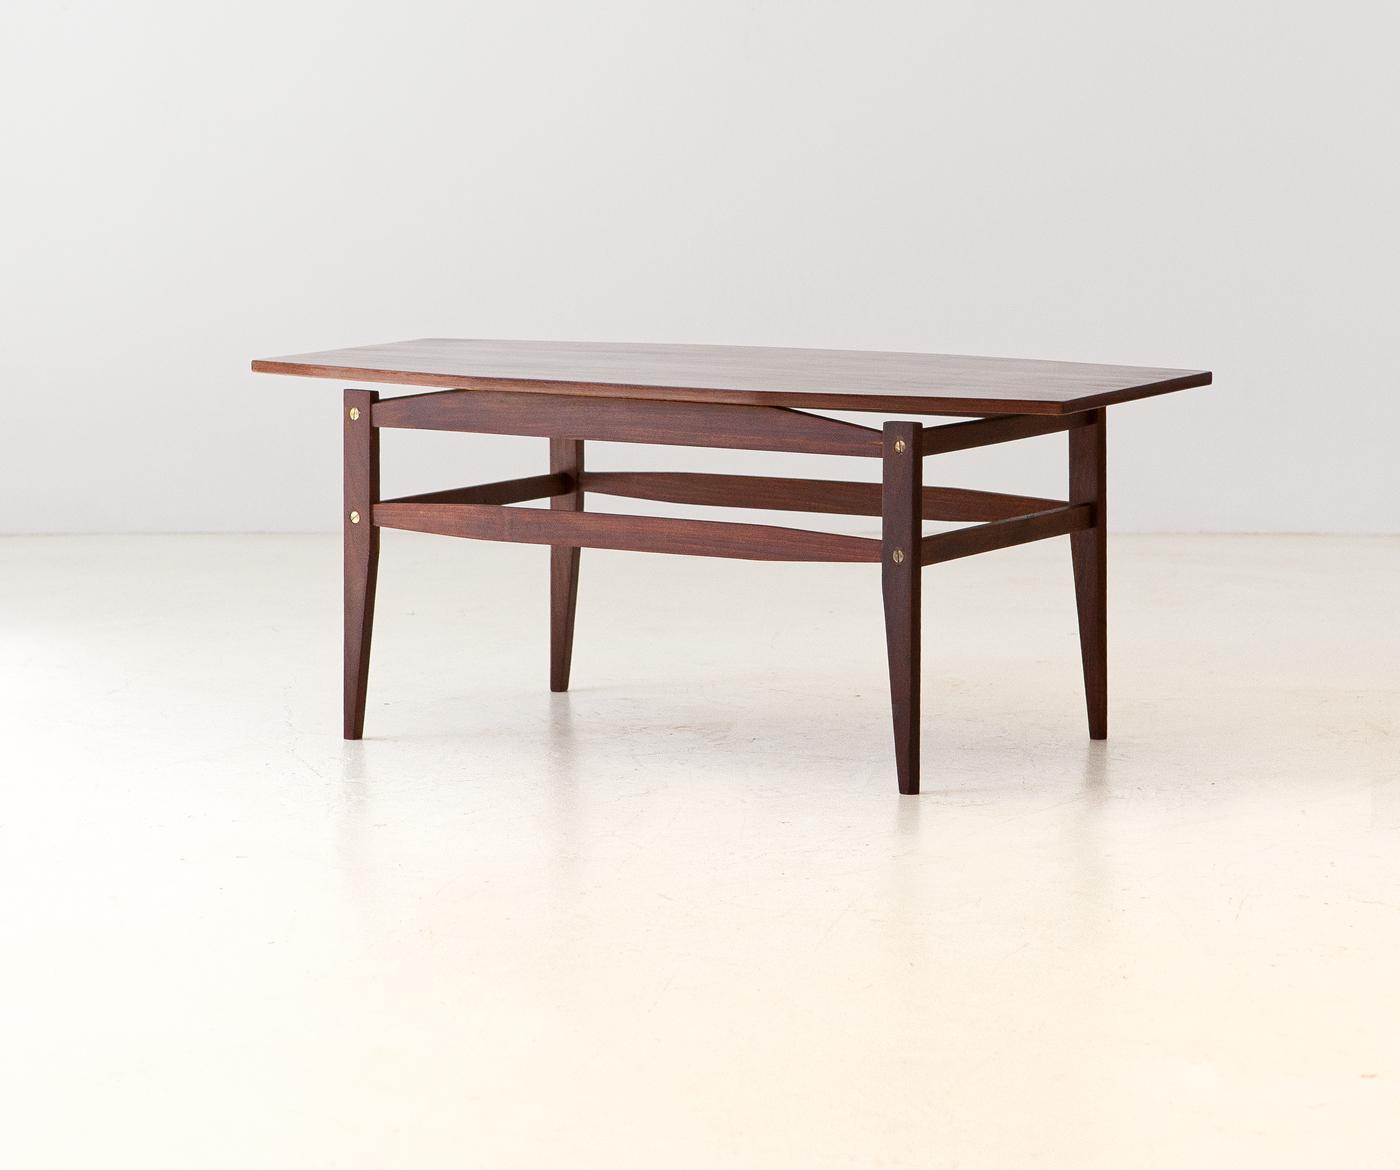 1950s-italian-modern-coffee-table-3-t90